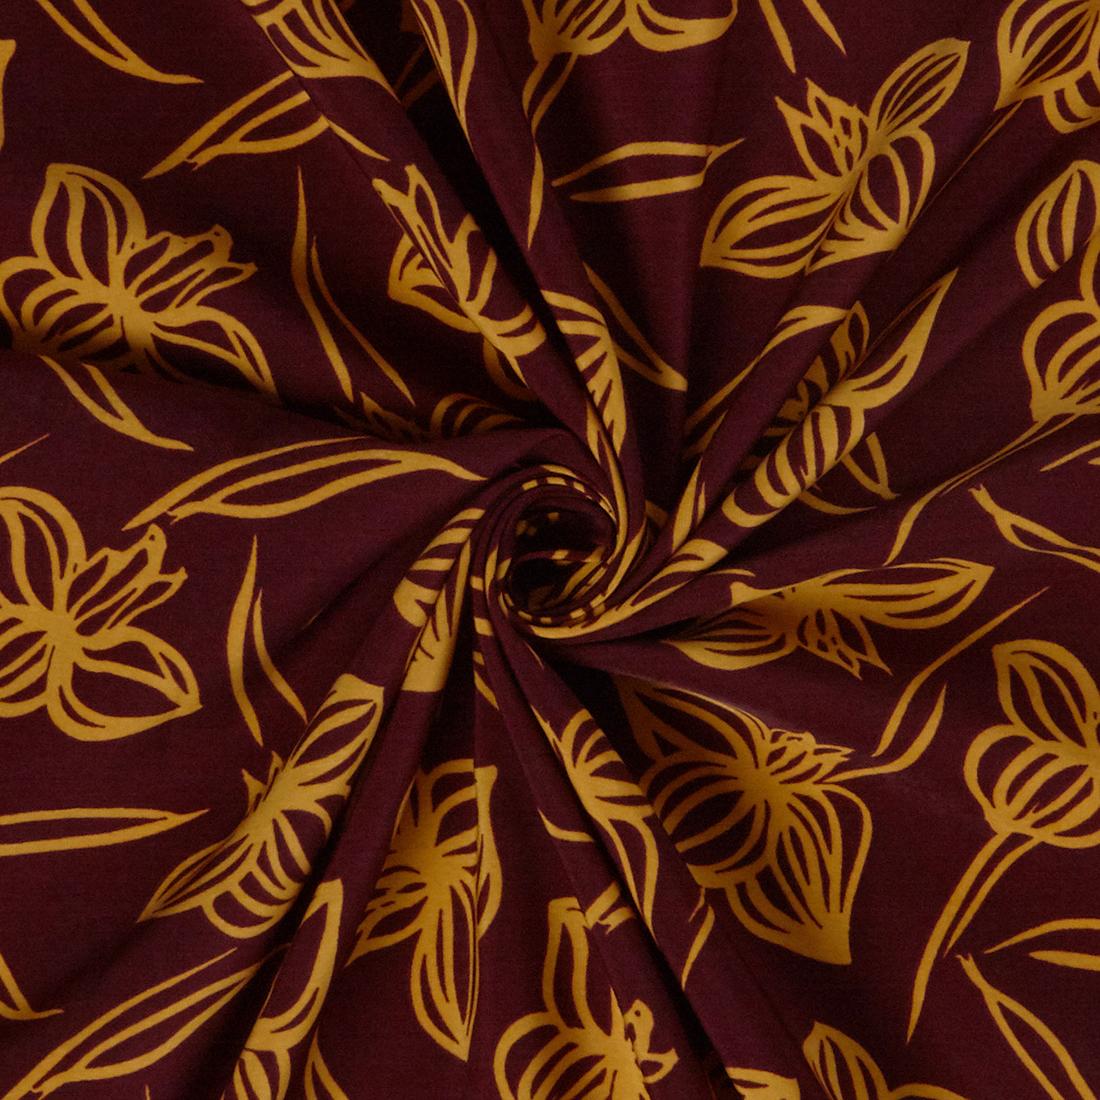 Line Floral Crepe Burgundy Dress Fabric